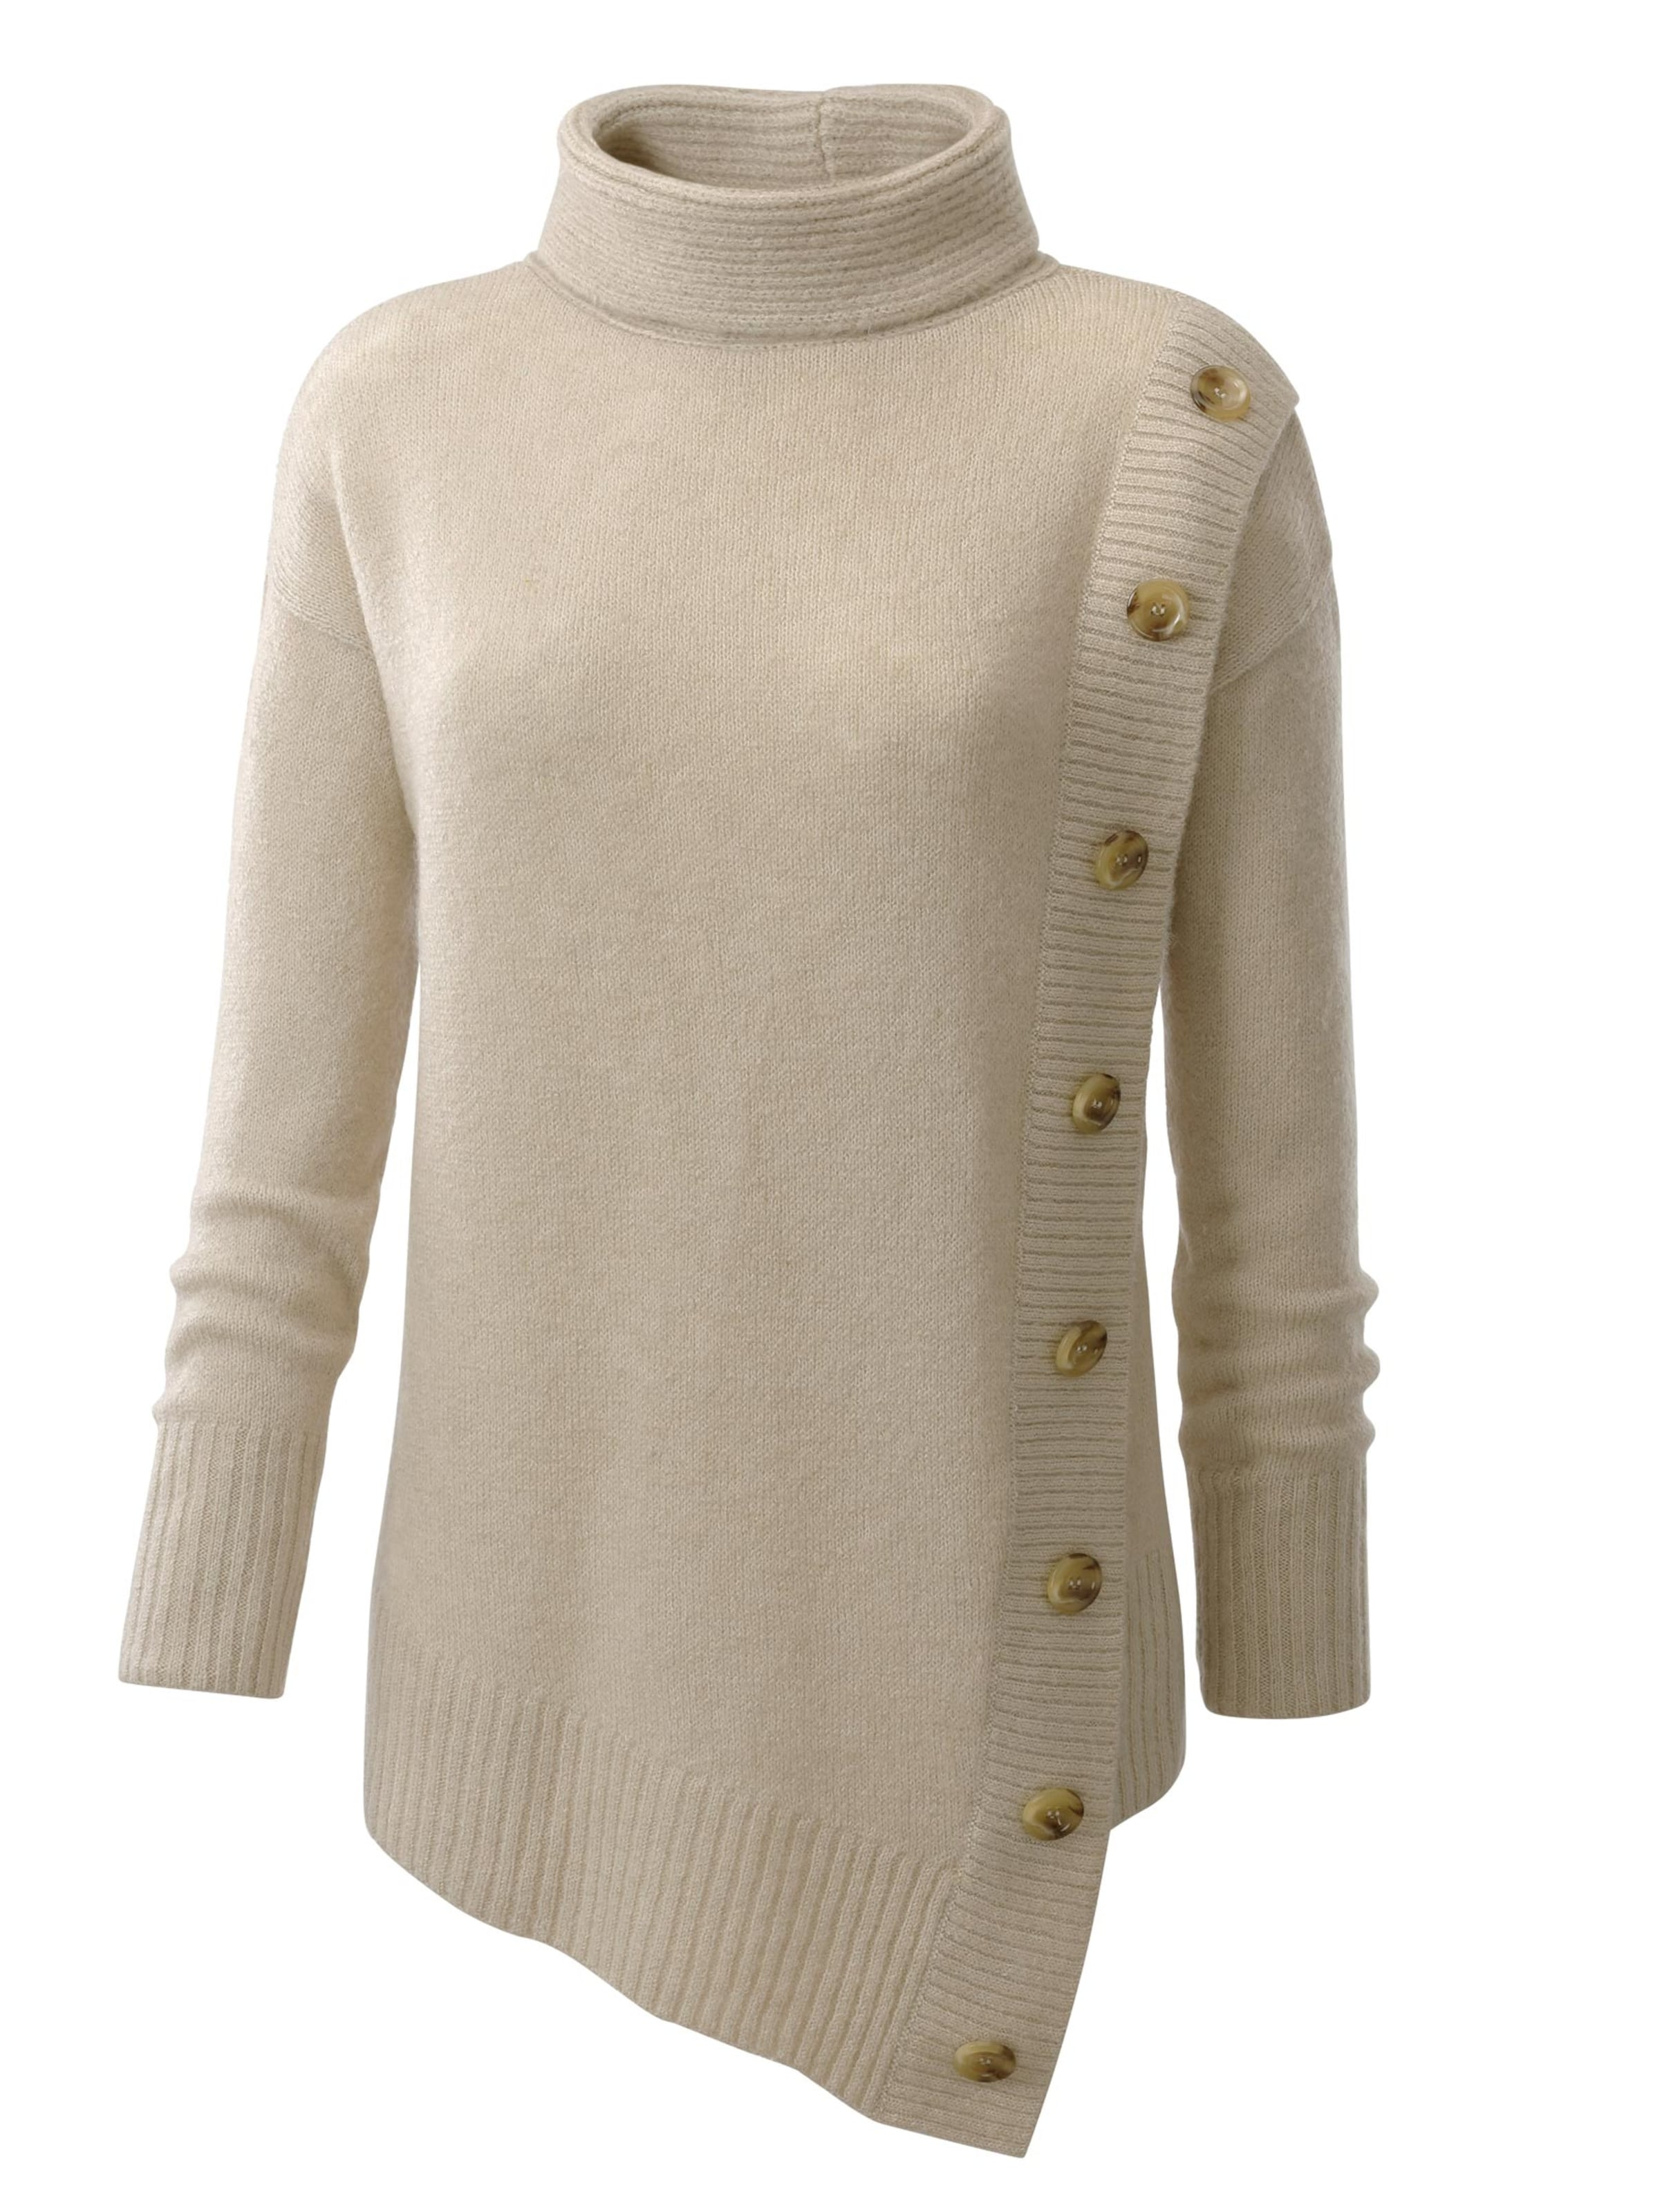 witt weiden -  Damen Rollkragen-Pullover beige-meliert